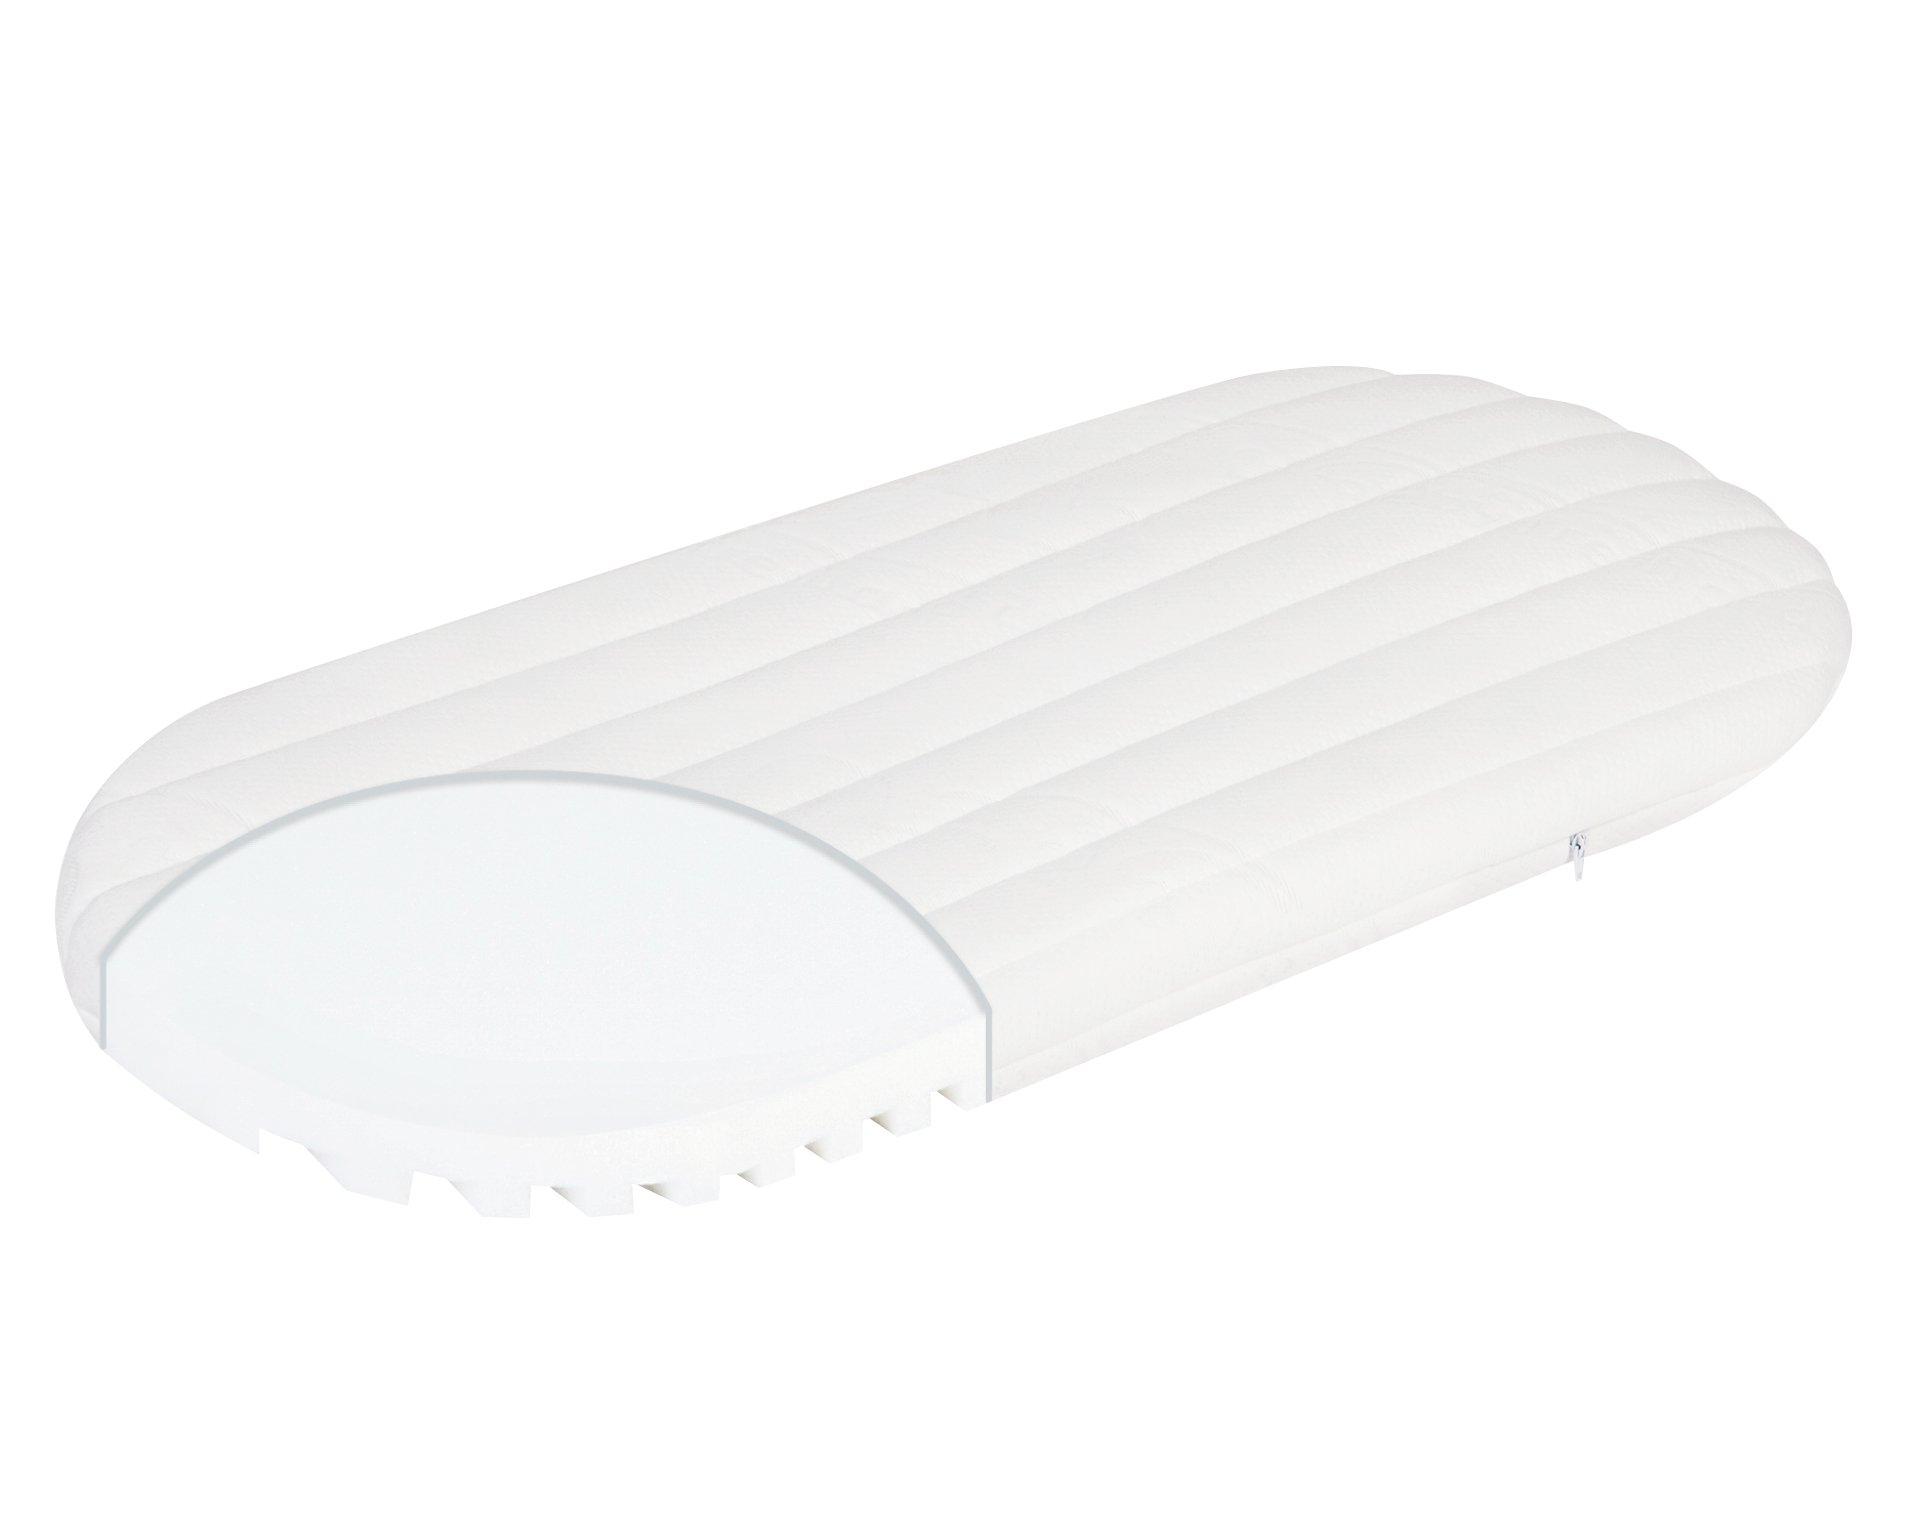 Zöllner 1640075320 Quadro Climatix Plus - Colchón para cochecito de bebé (75 x 32 cm